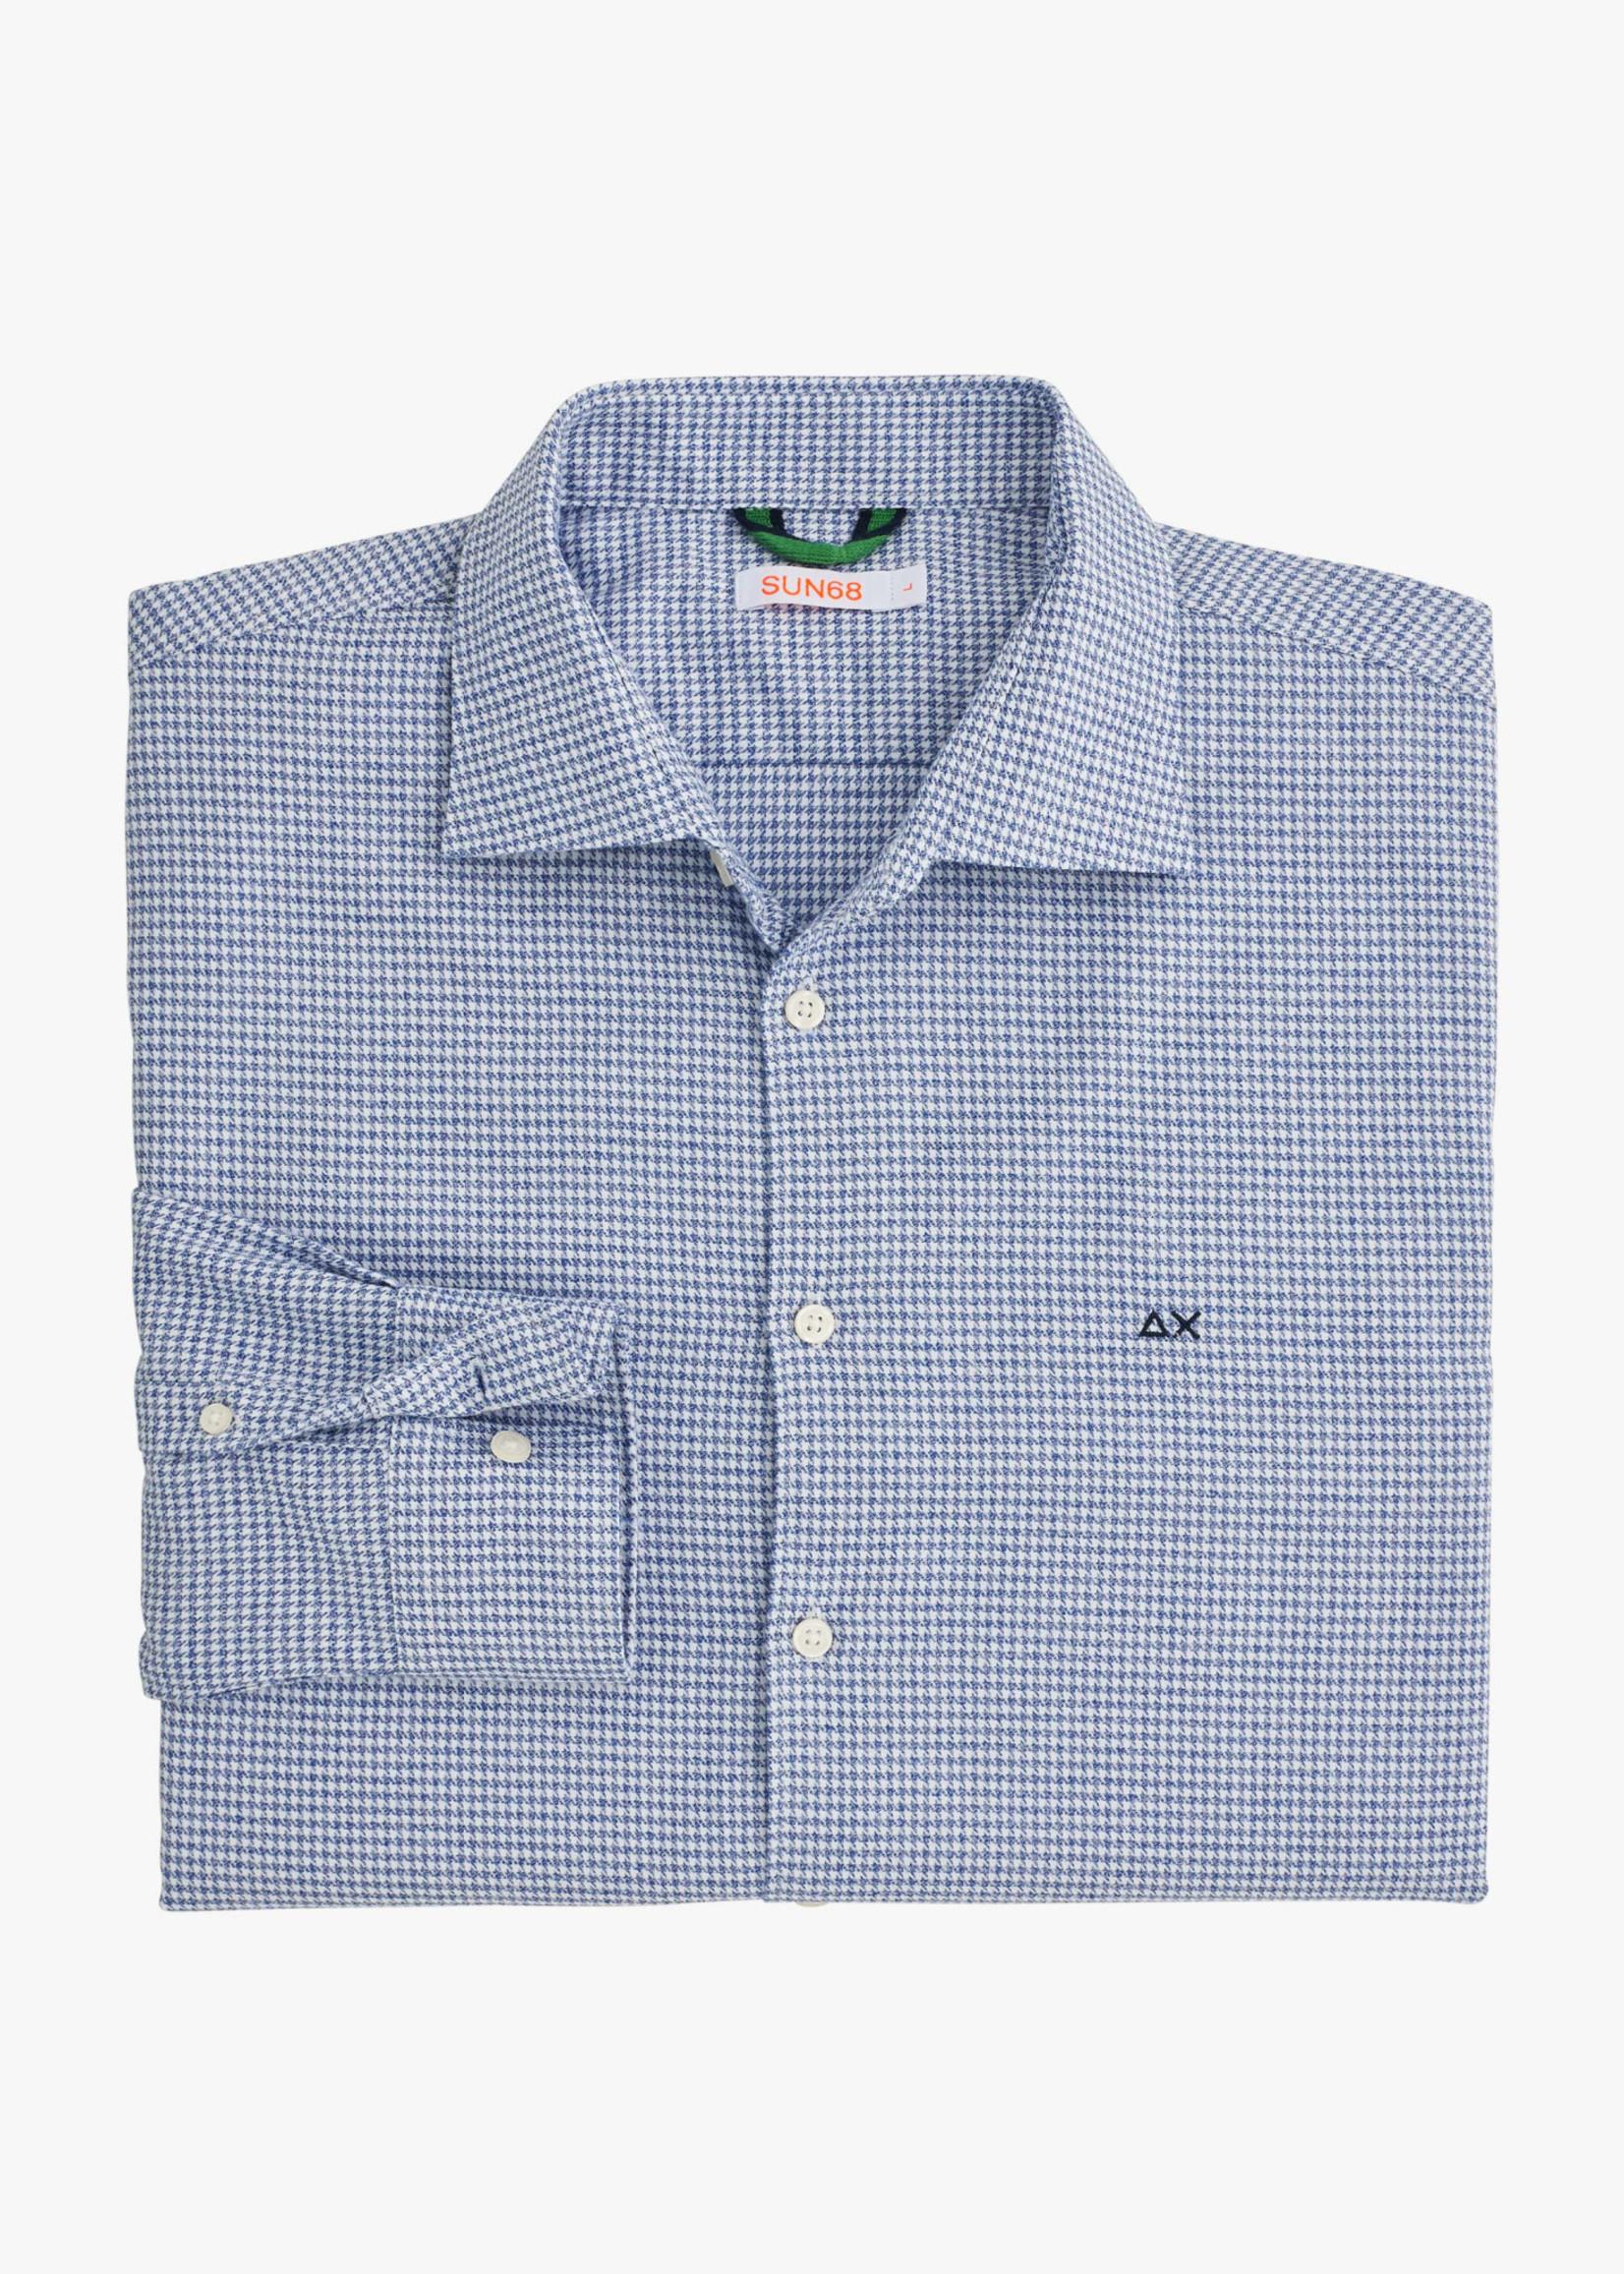 SUN68 Shirt Details French Collar L/S | Lichtblauw | SUN68